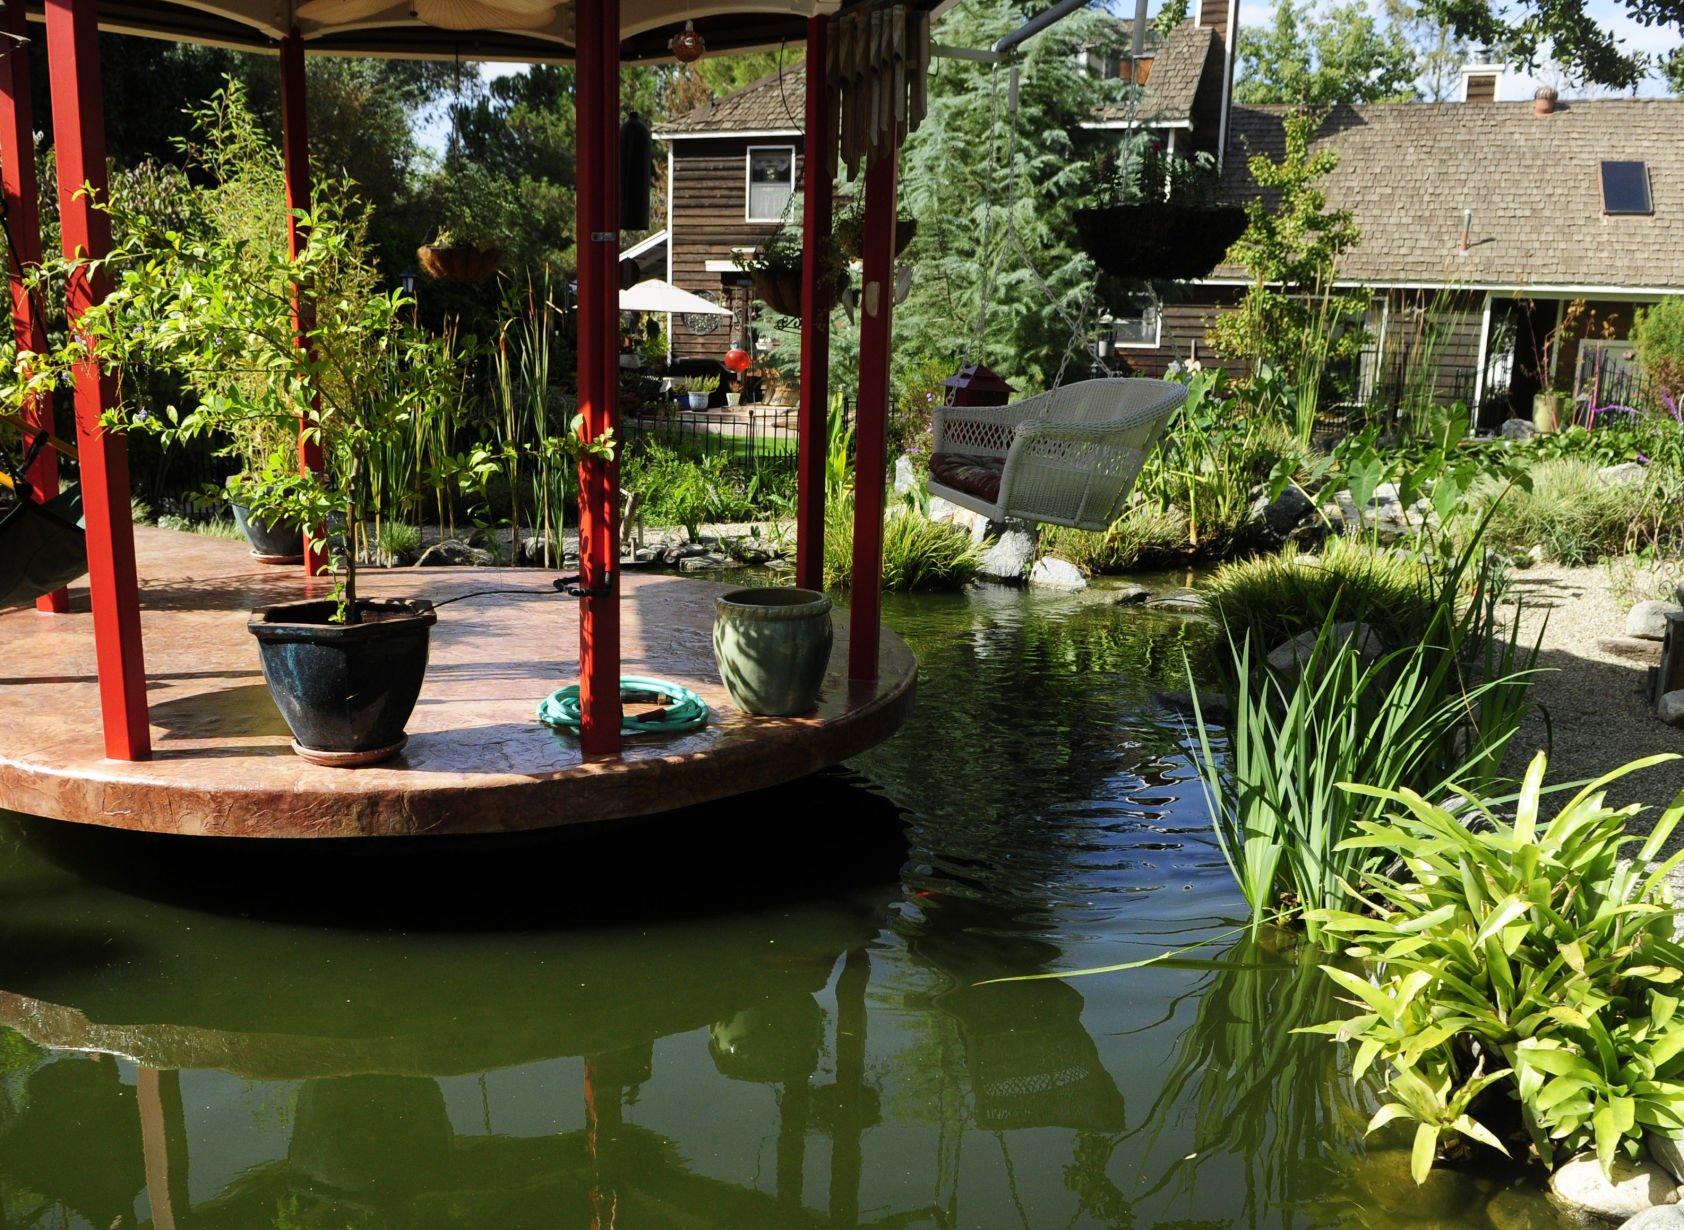 398191916 datajpg On golden ponds Tour lets you